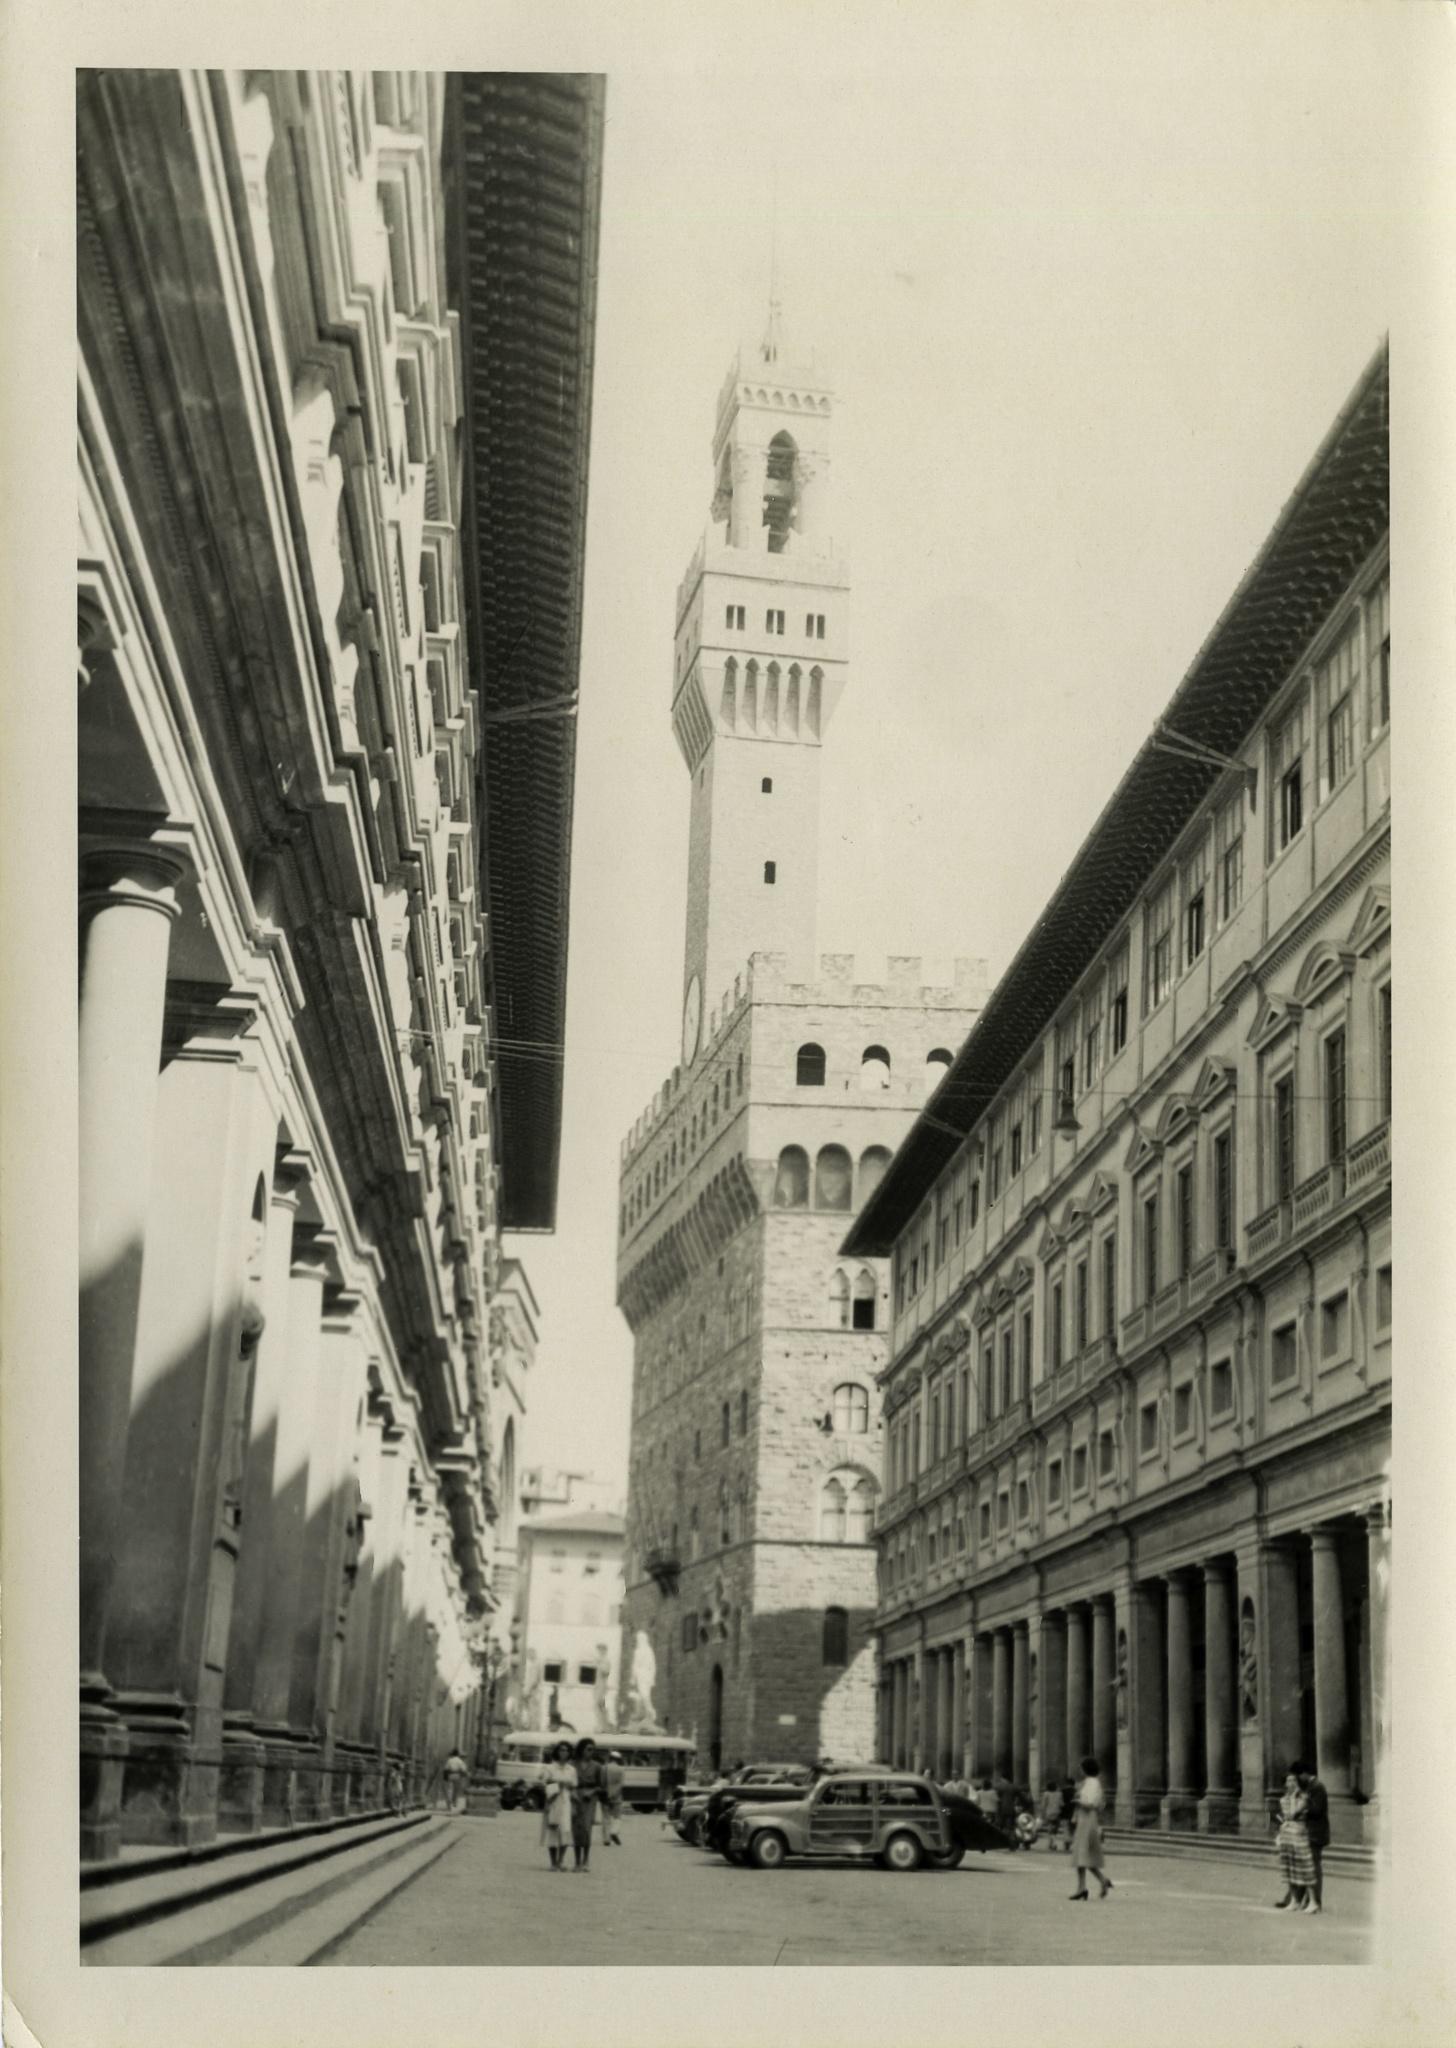 """Palazzo vecchio"" and station wagon, Italy, ca. 1970 by Martine de Lajudie"